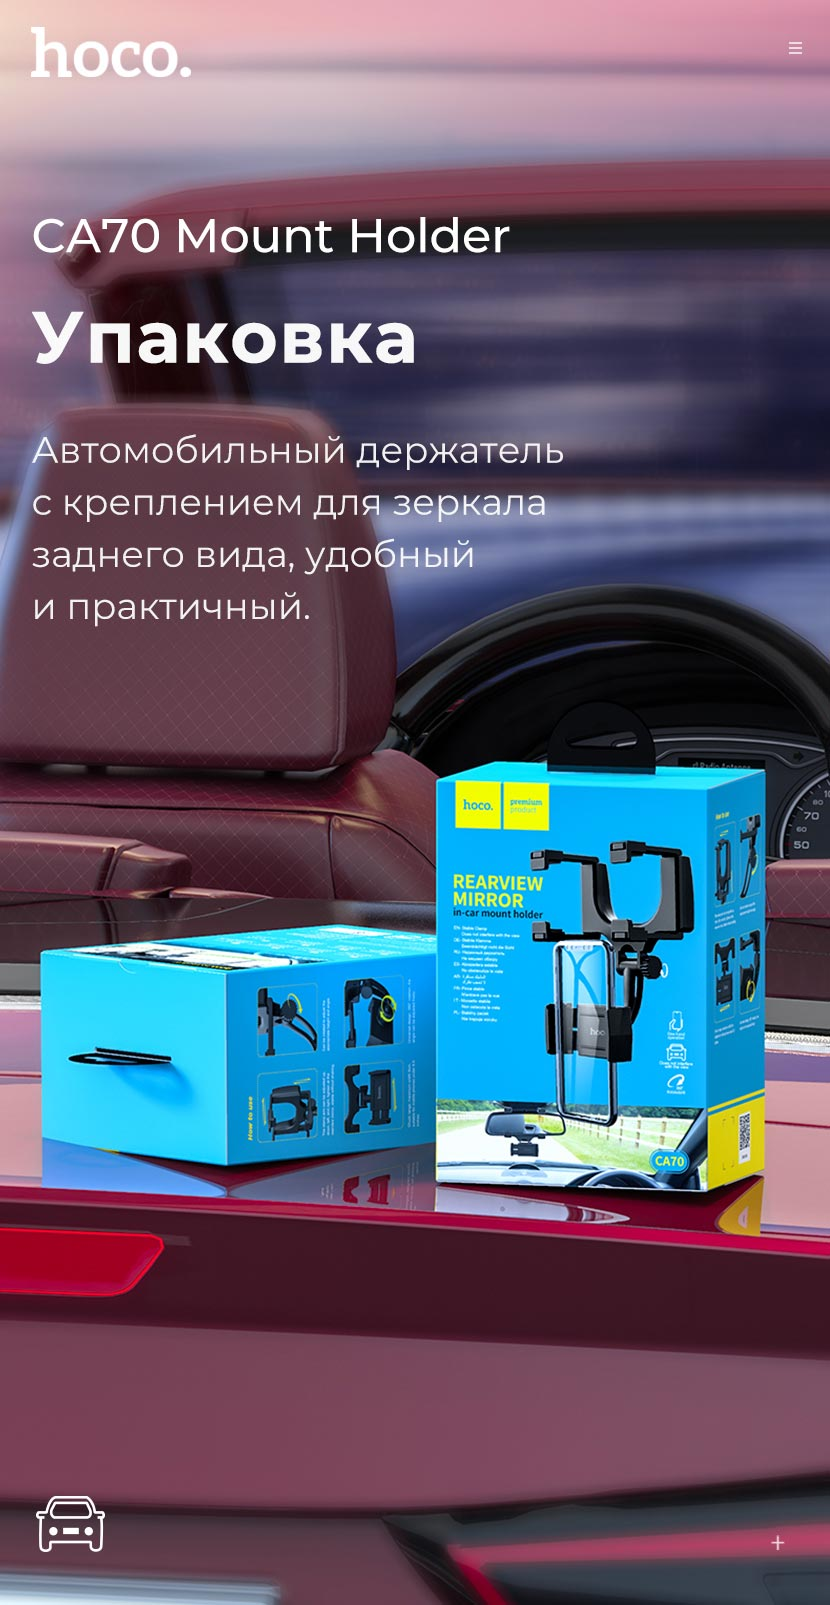 hoco news ca70 pilot in car rearview mirror mount holder package ru